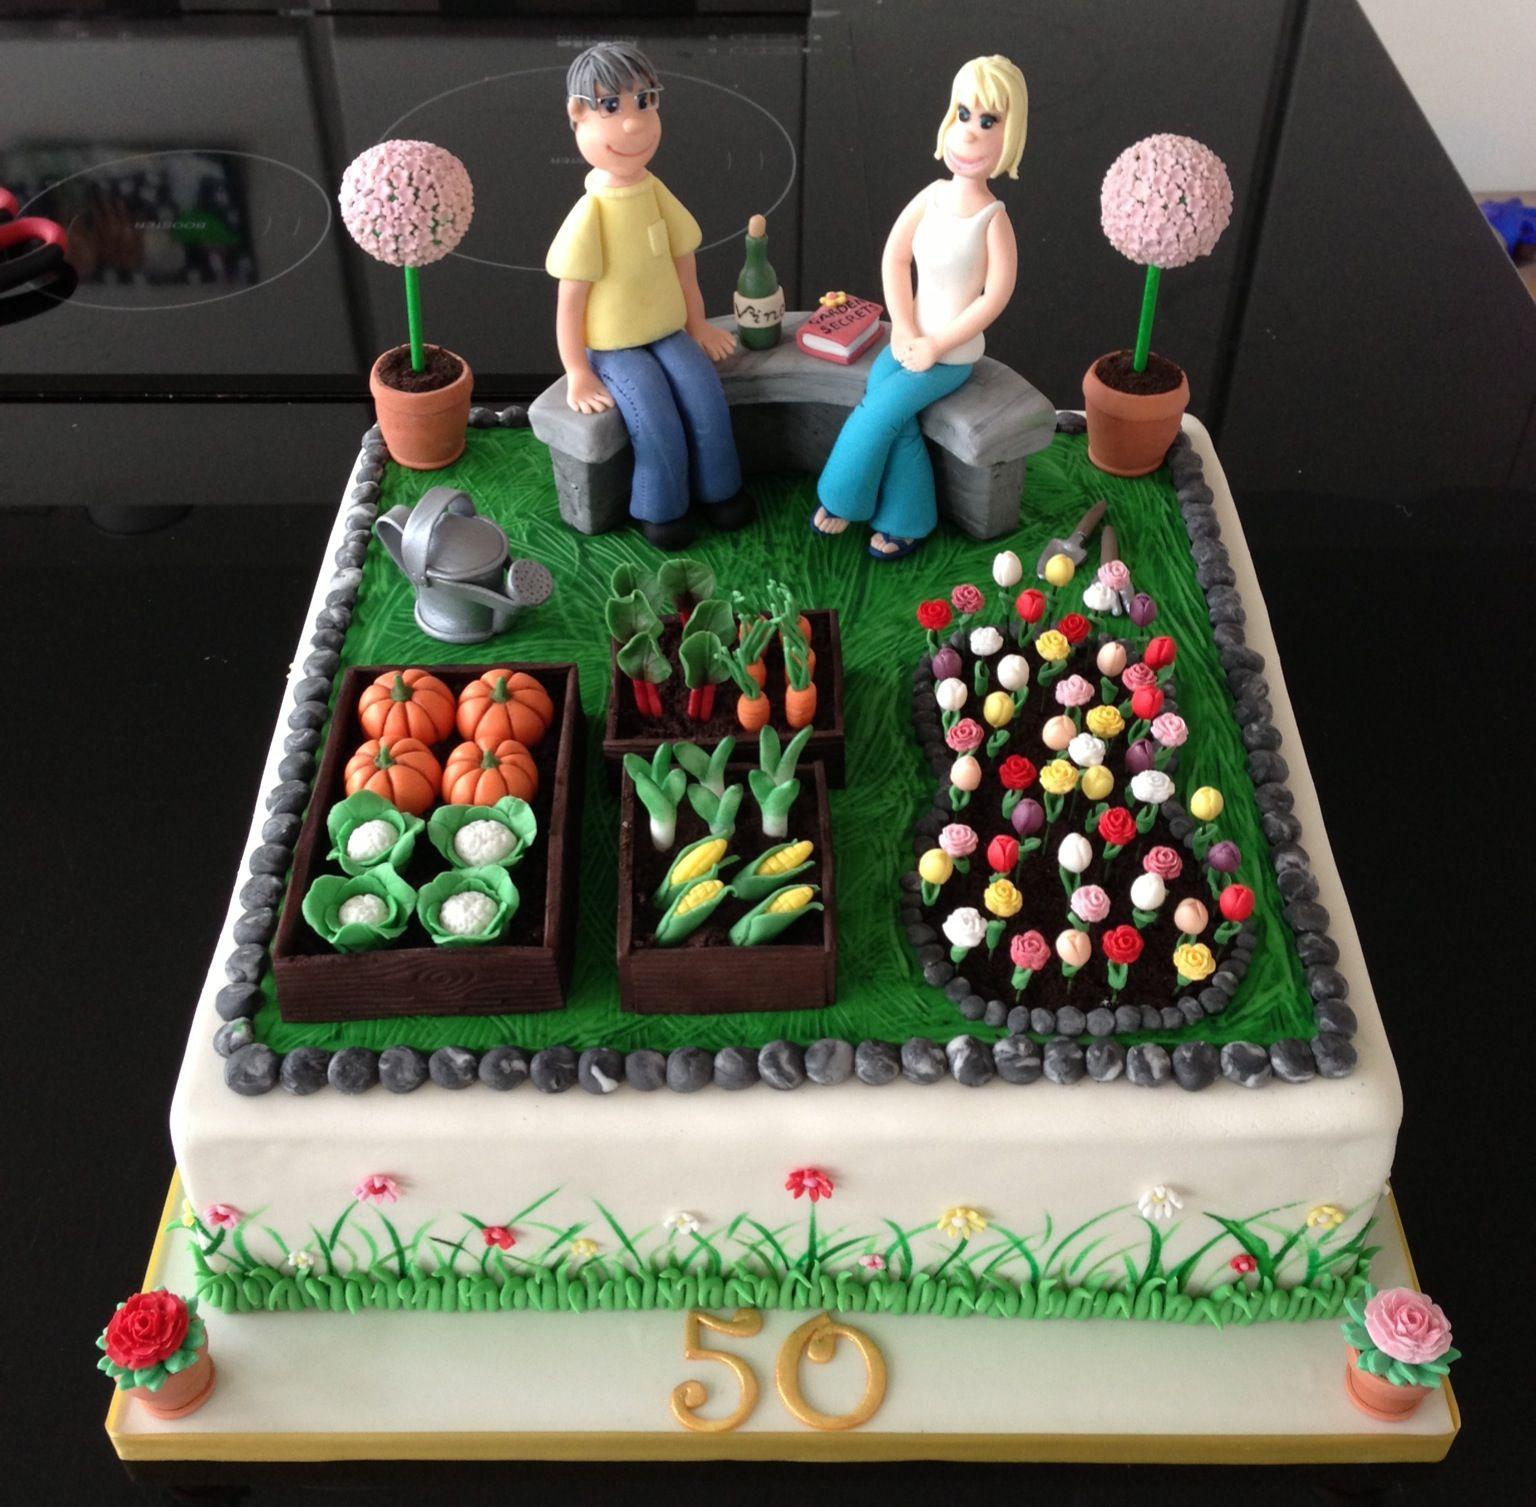 gardening cake garden cake garten torte pinterest. Black Bedroom Furniture Sets. Home Design Ideas